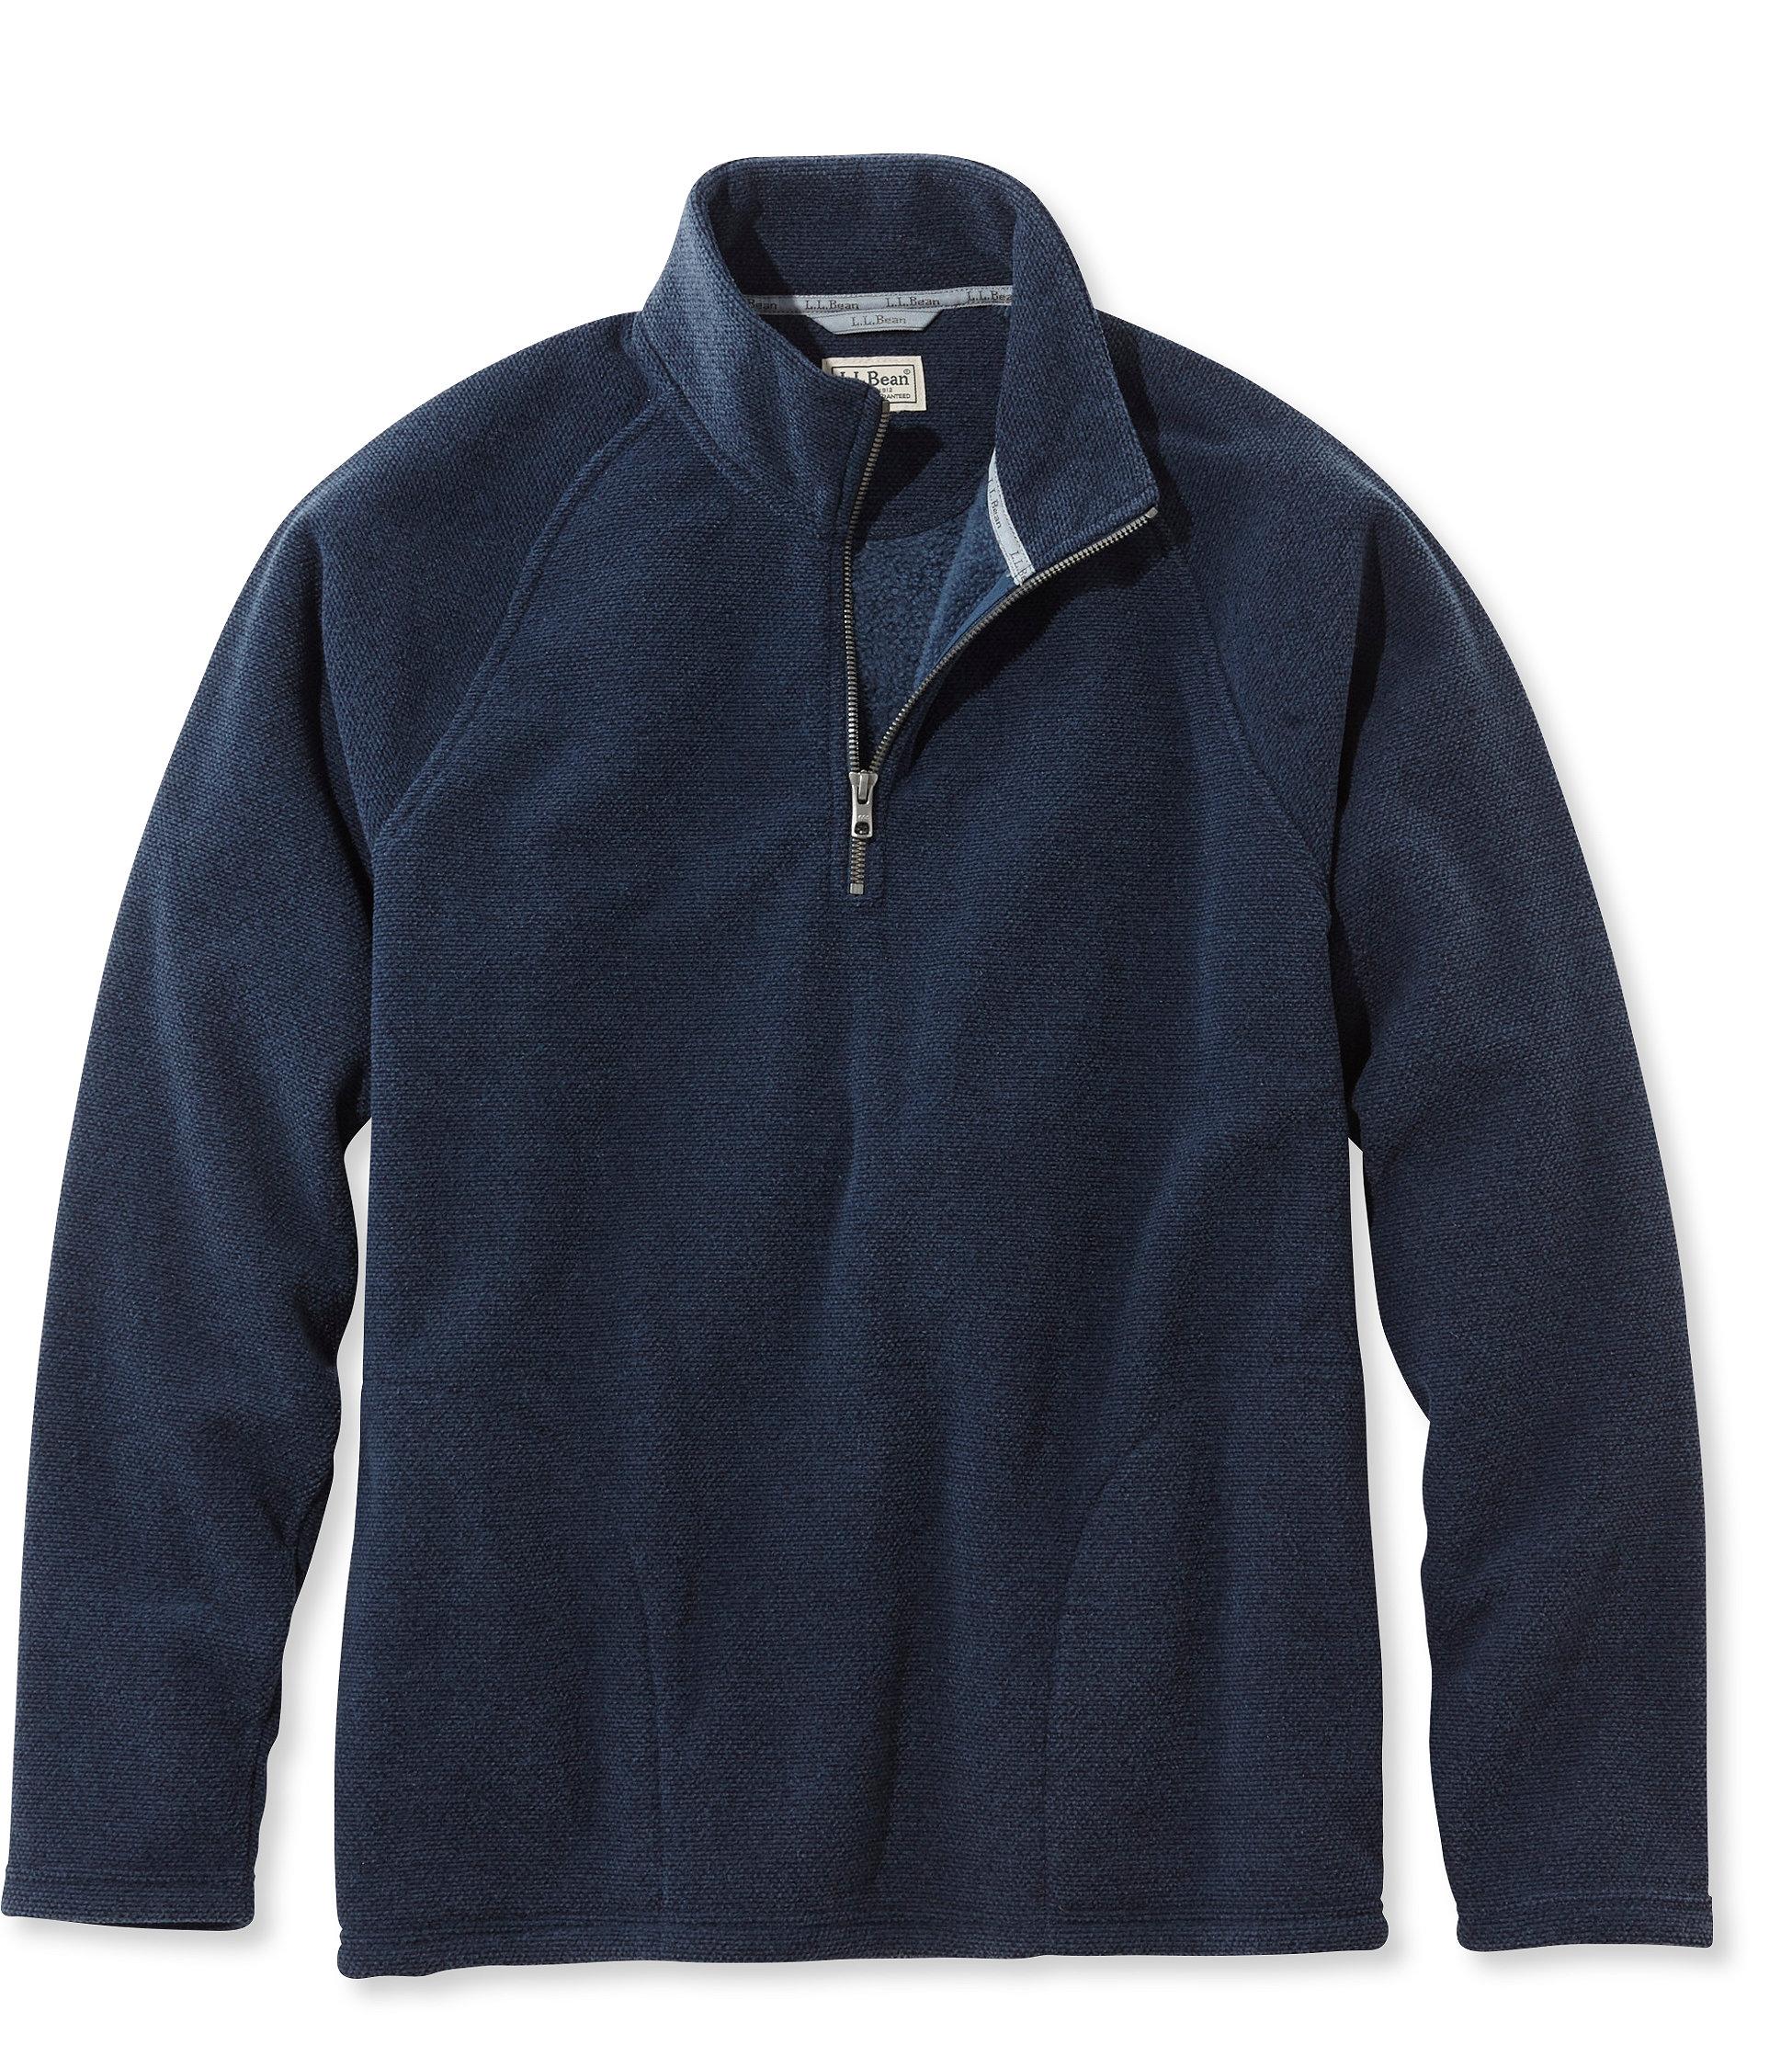 photo: L.L.Bean Textured Fleece Quarter-Zip, Slightly Fitted fleece top